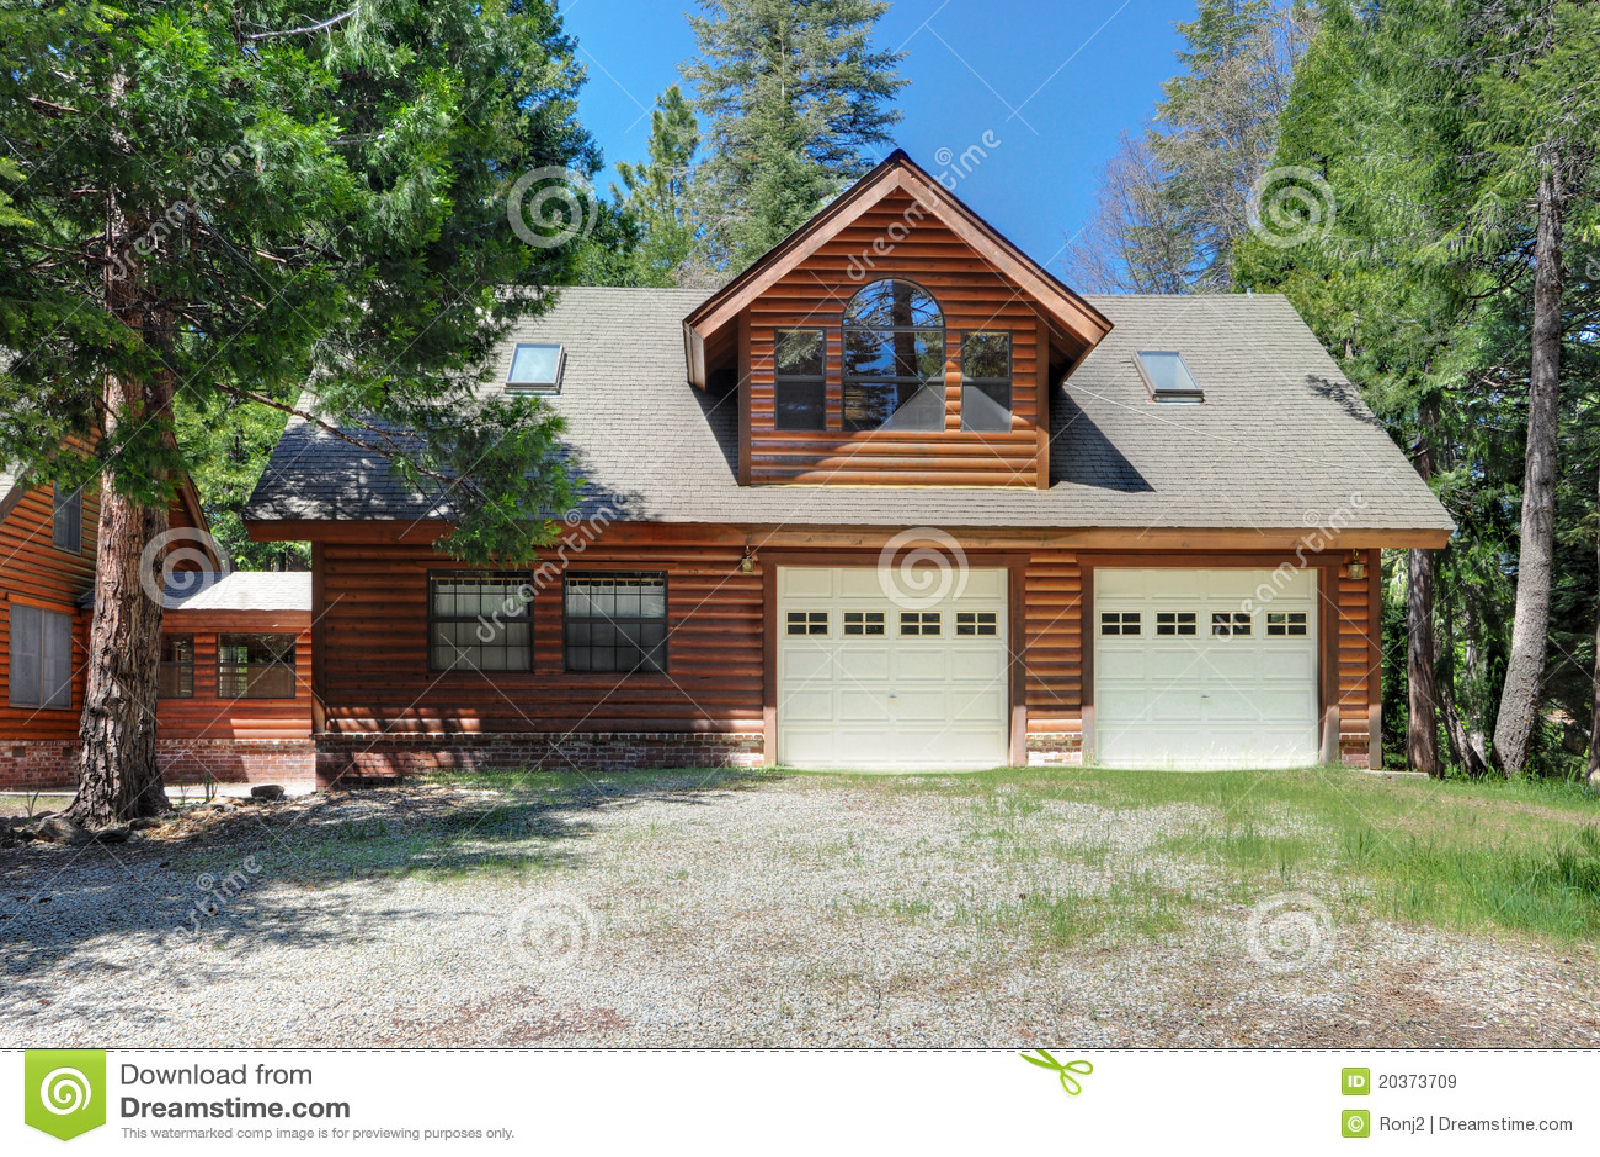 Log House Garage Royalty Free Stock Images Image 20373709